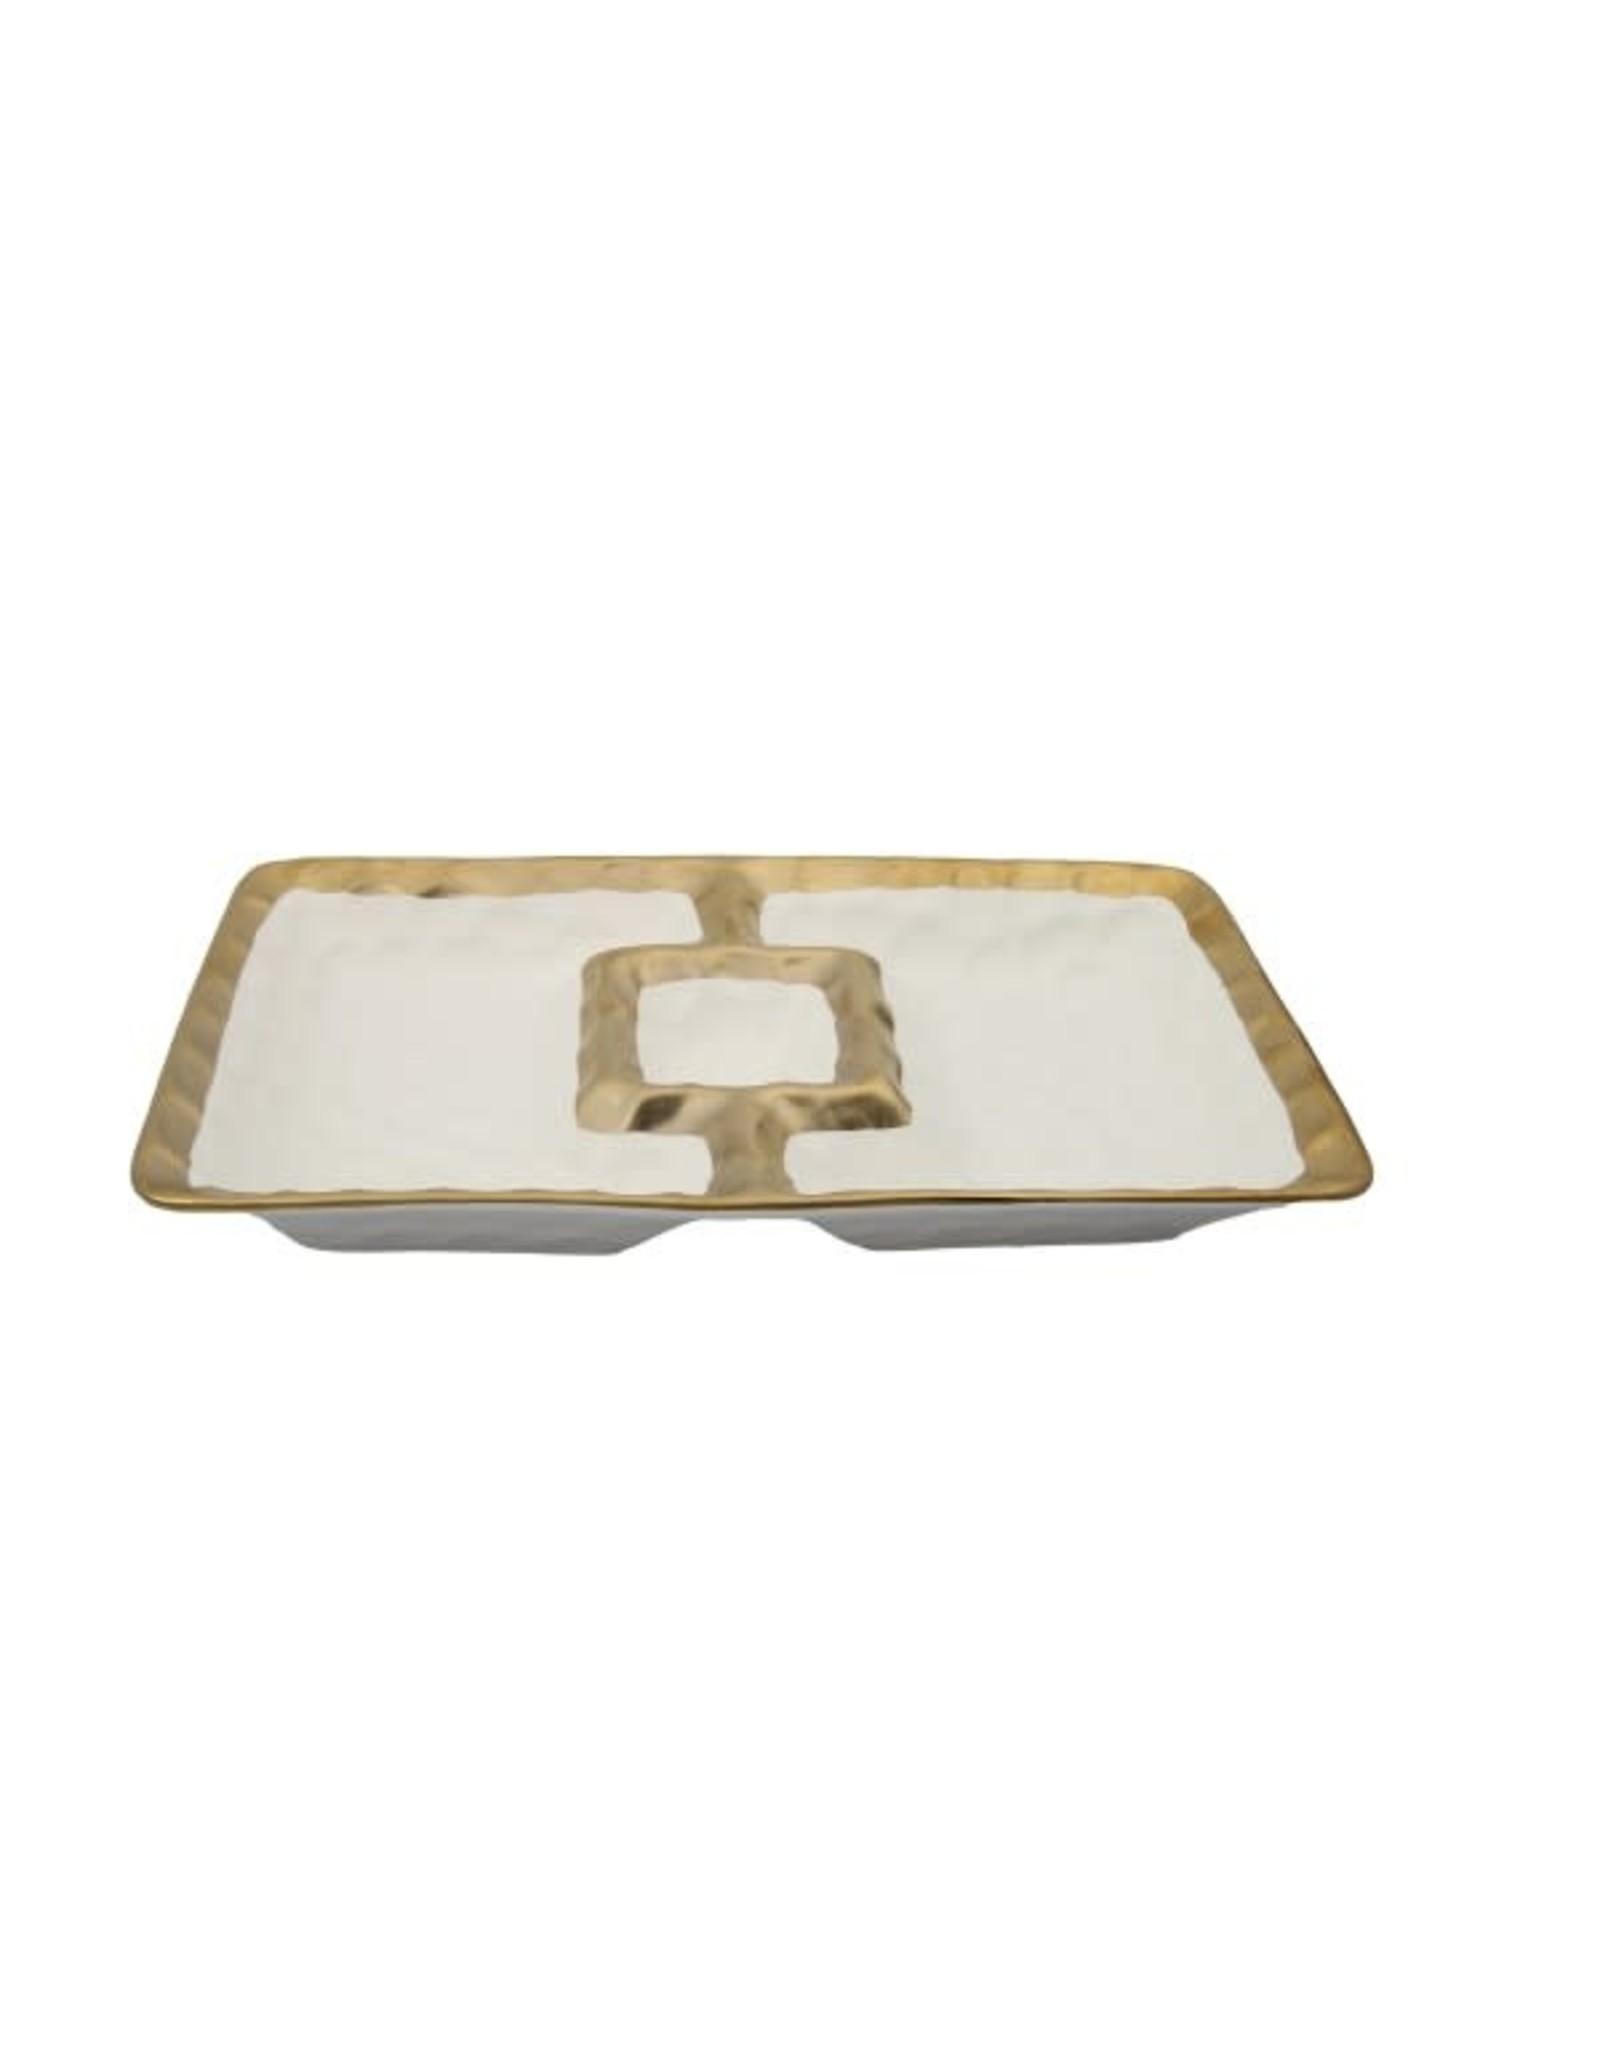 "WPD571 White Porcelain Chip & Dip Bowl with Gold Border - 12""L x 7""W"